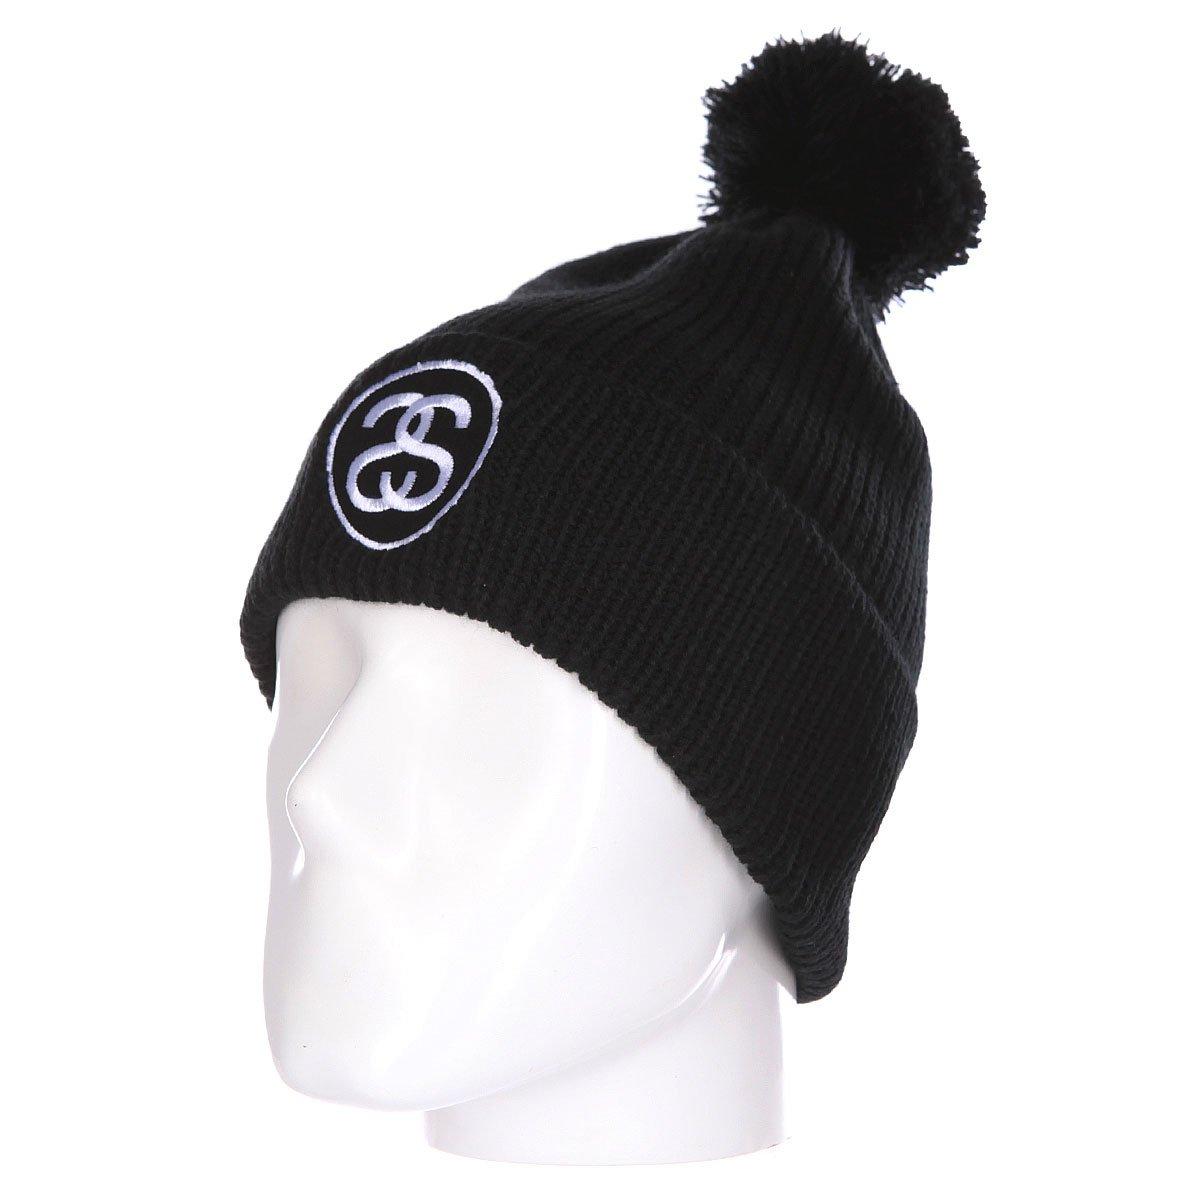 01a183ec91c Купить шапку Stussy Ss-Link Pom Beanie Black в интернет-магазине ...